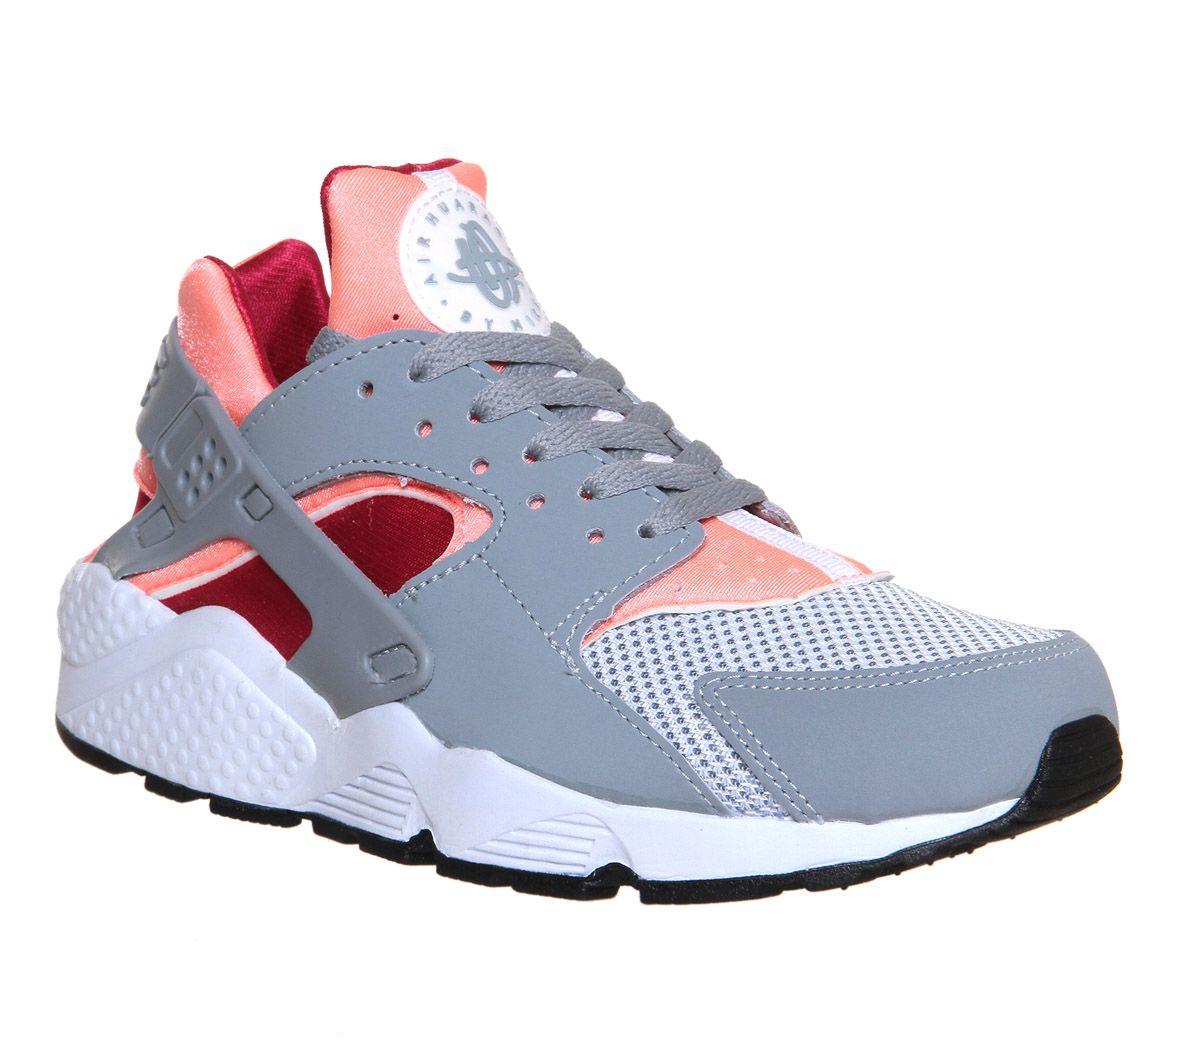 c7a616b03cd2 Nike Air Huarache Grey Pink Fuschia W - His trainers